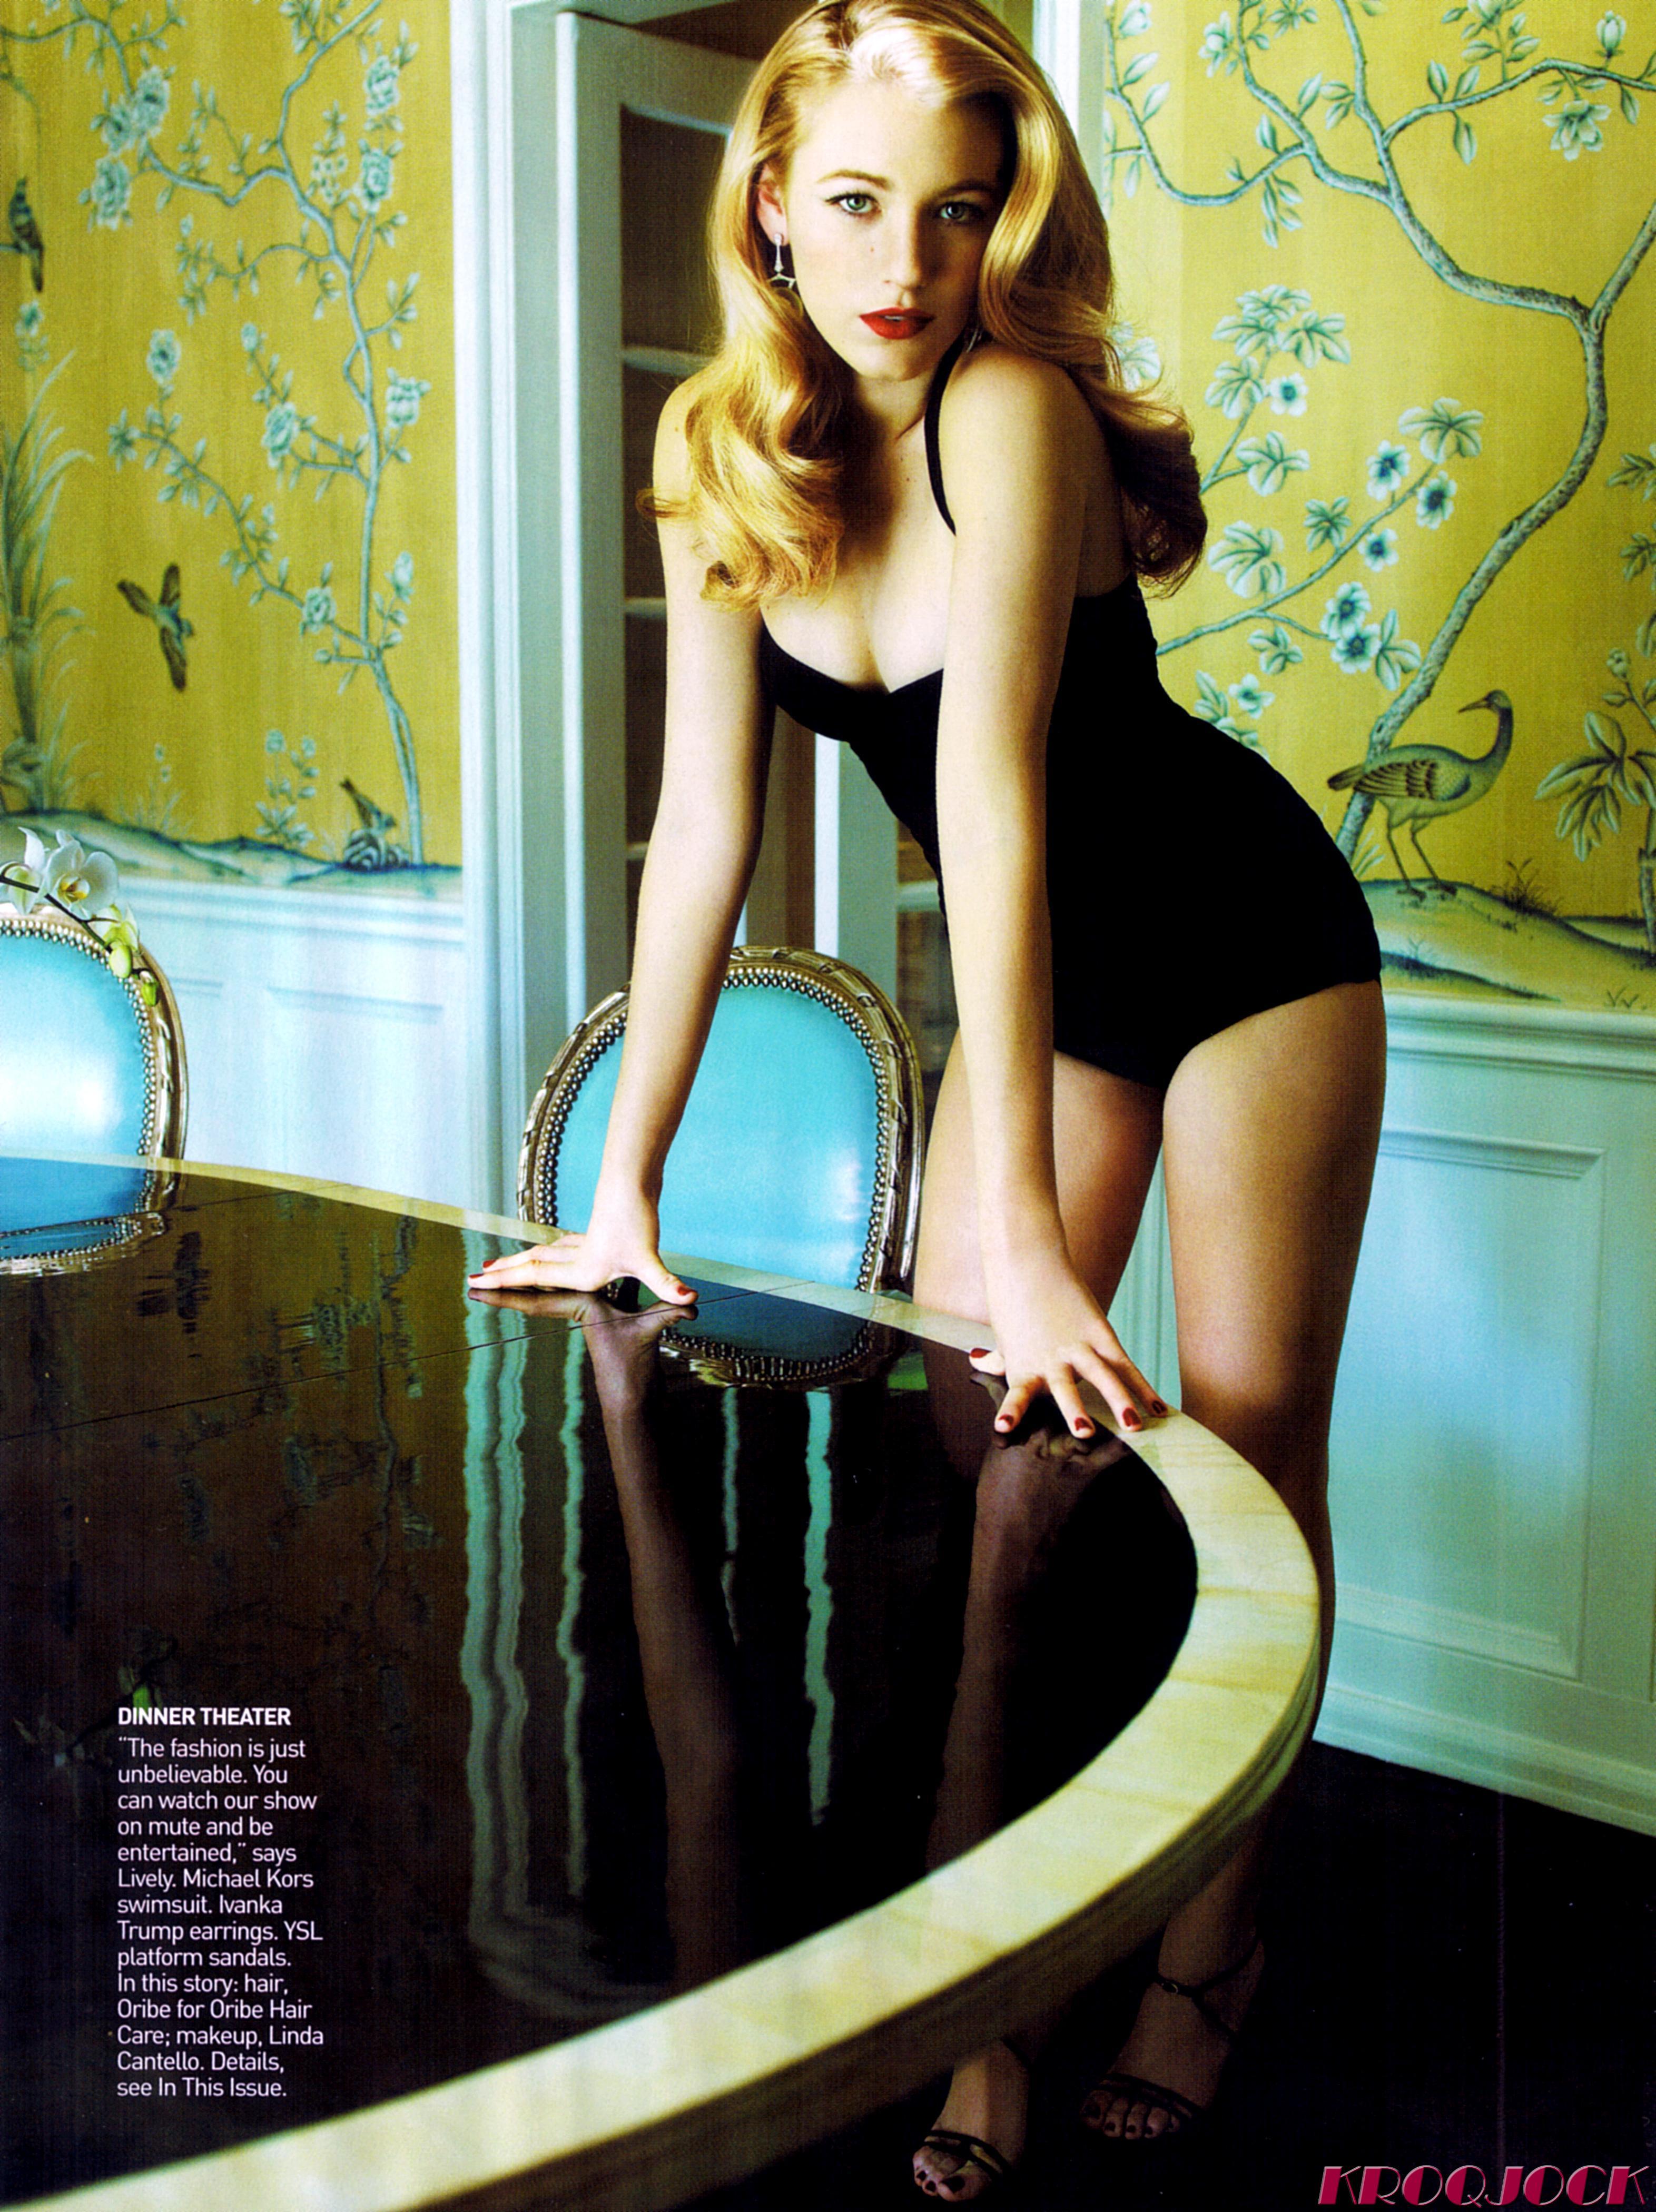 19038_Blake_Lively_Vogue_February_2009_05_122_956lo.jpg